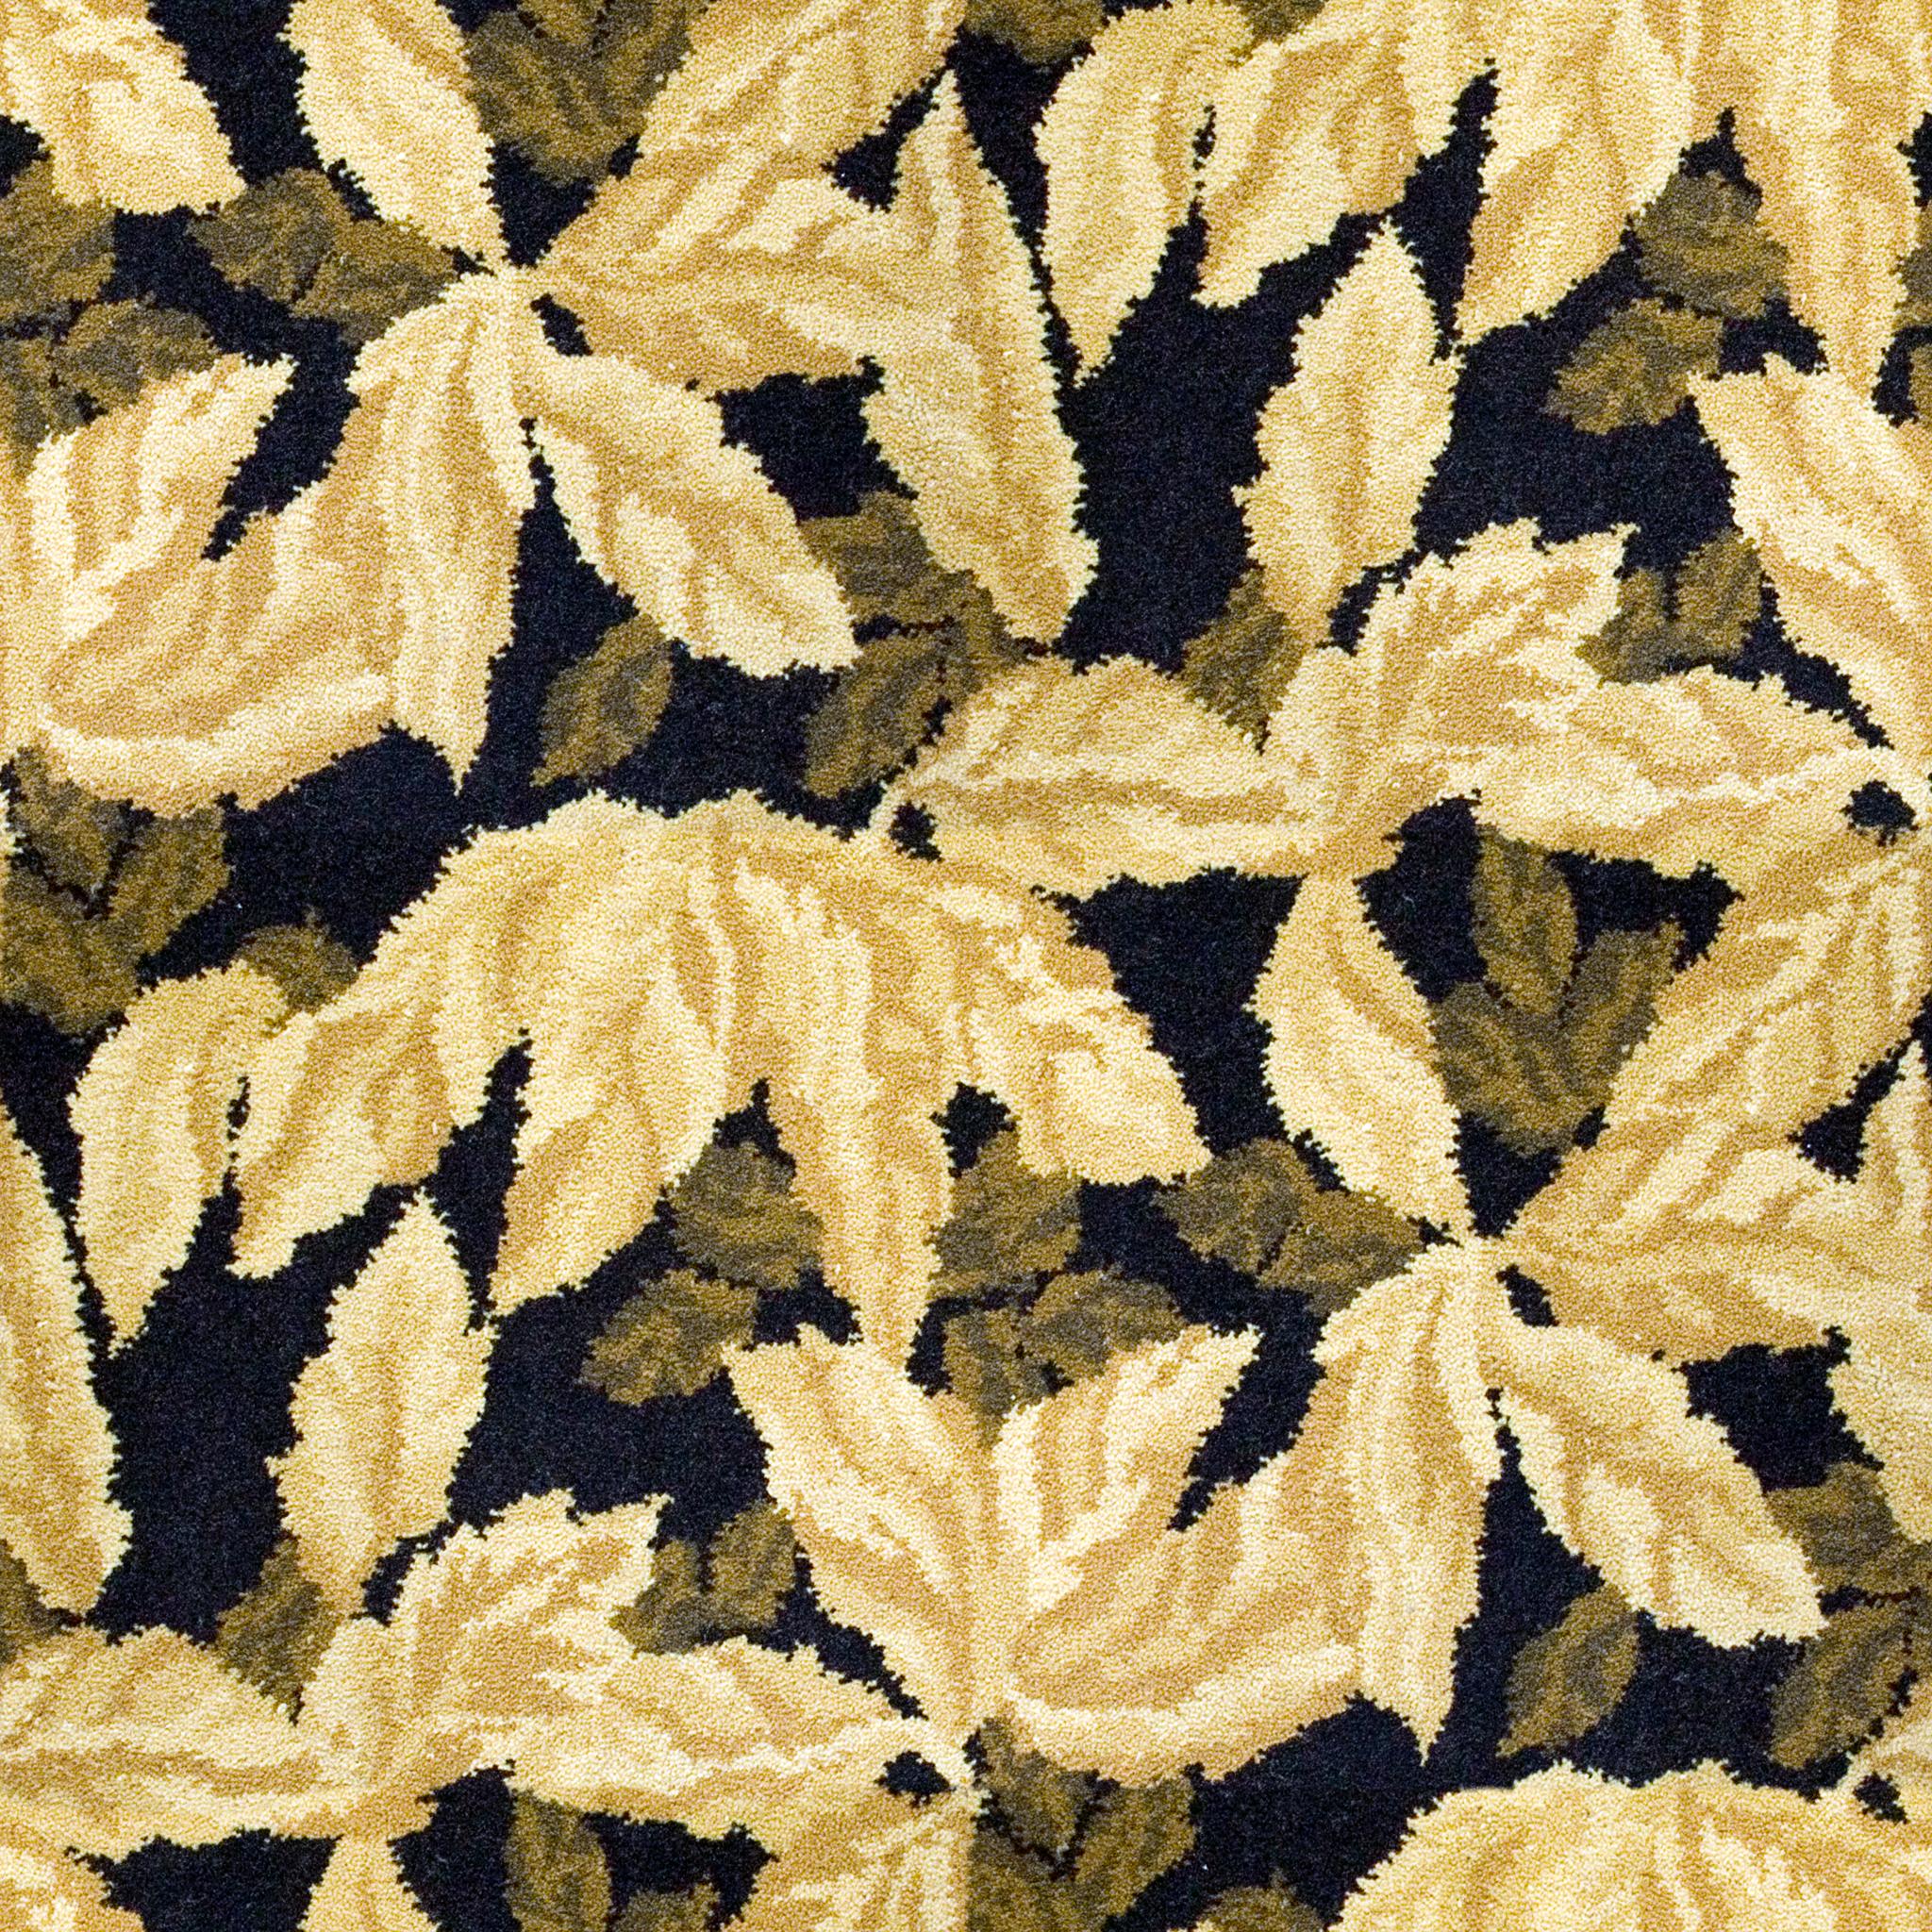 Leafy Falls Carpet.jpg